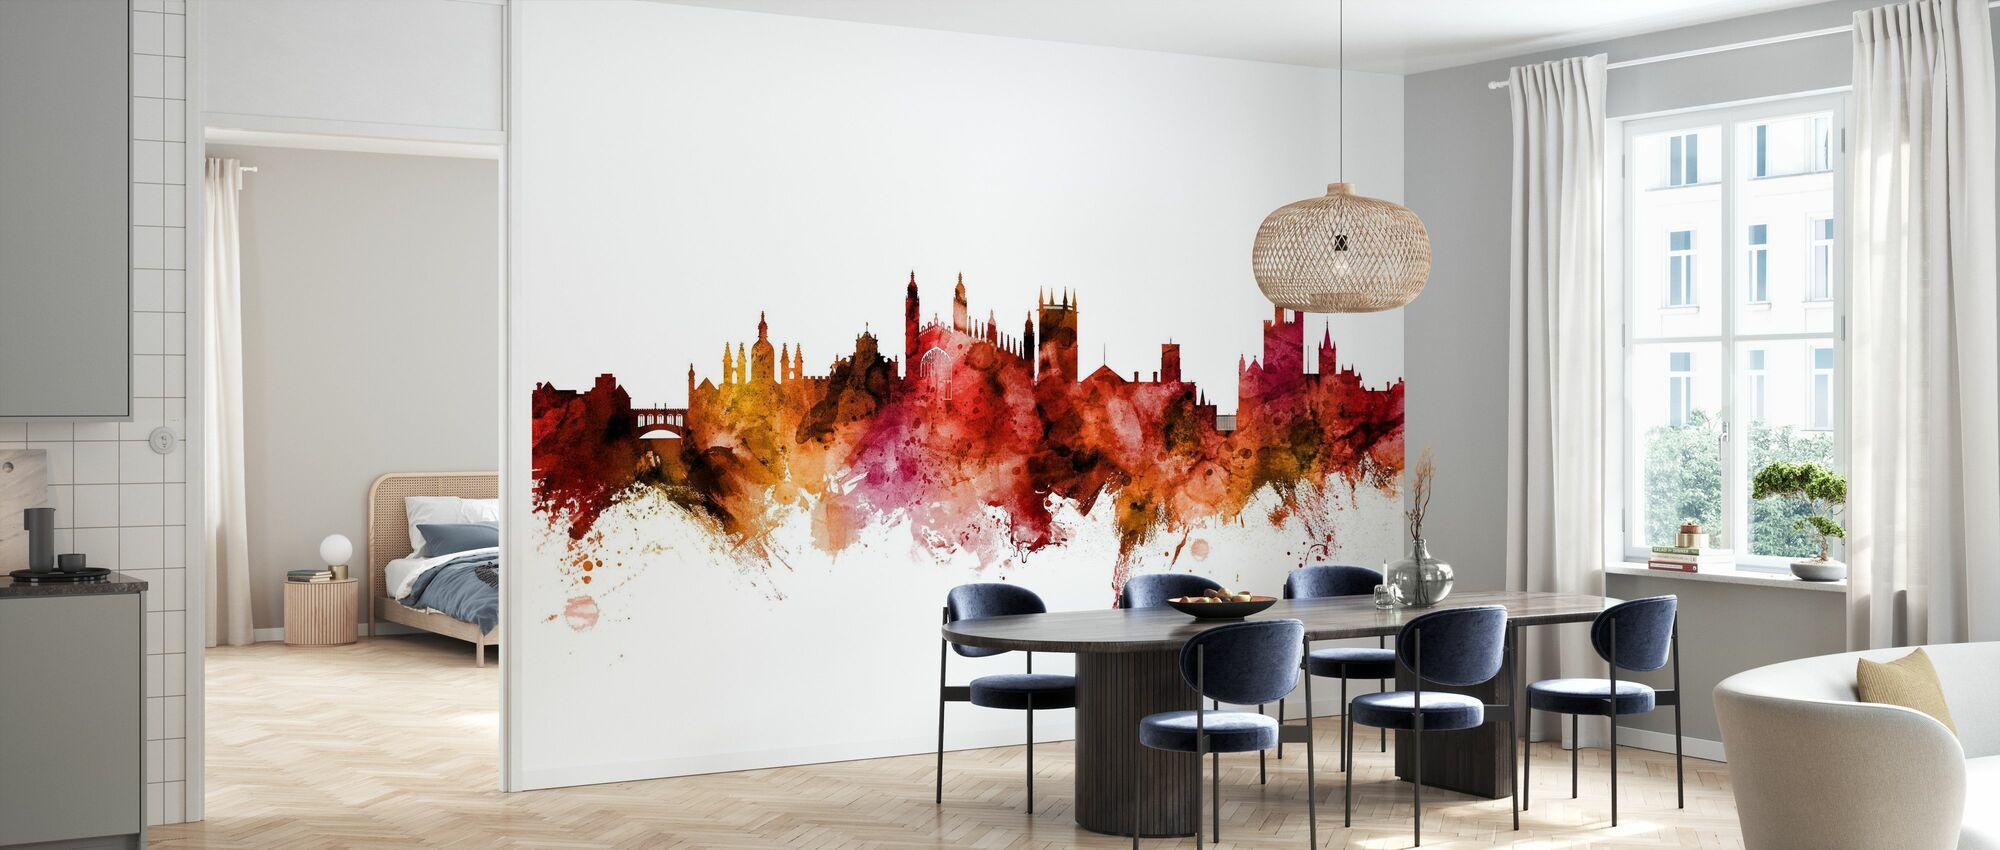 Cambridge England Skyline - Wallpaper - Kitchen